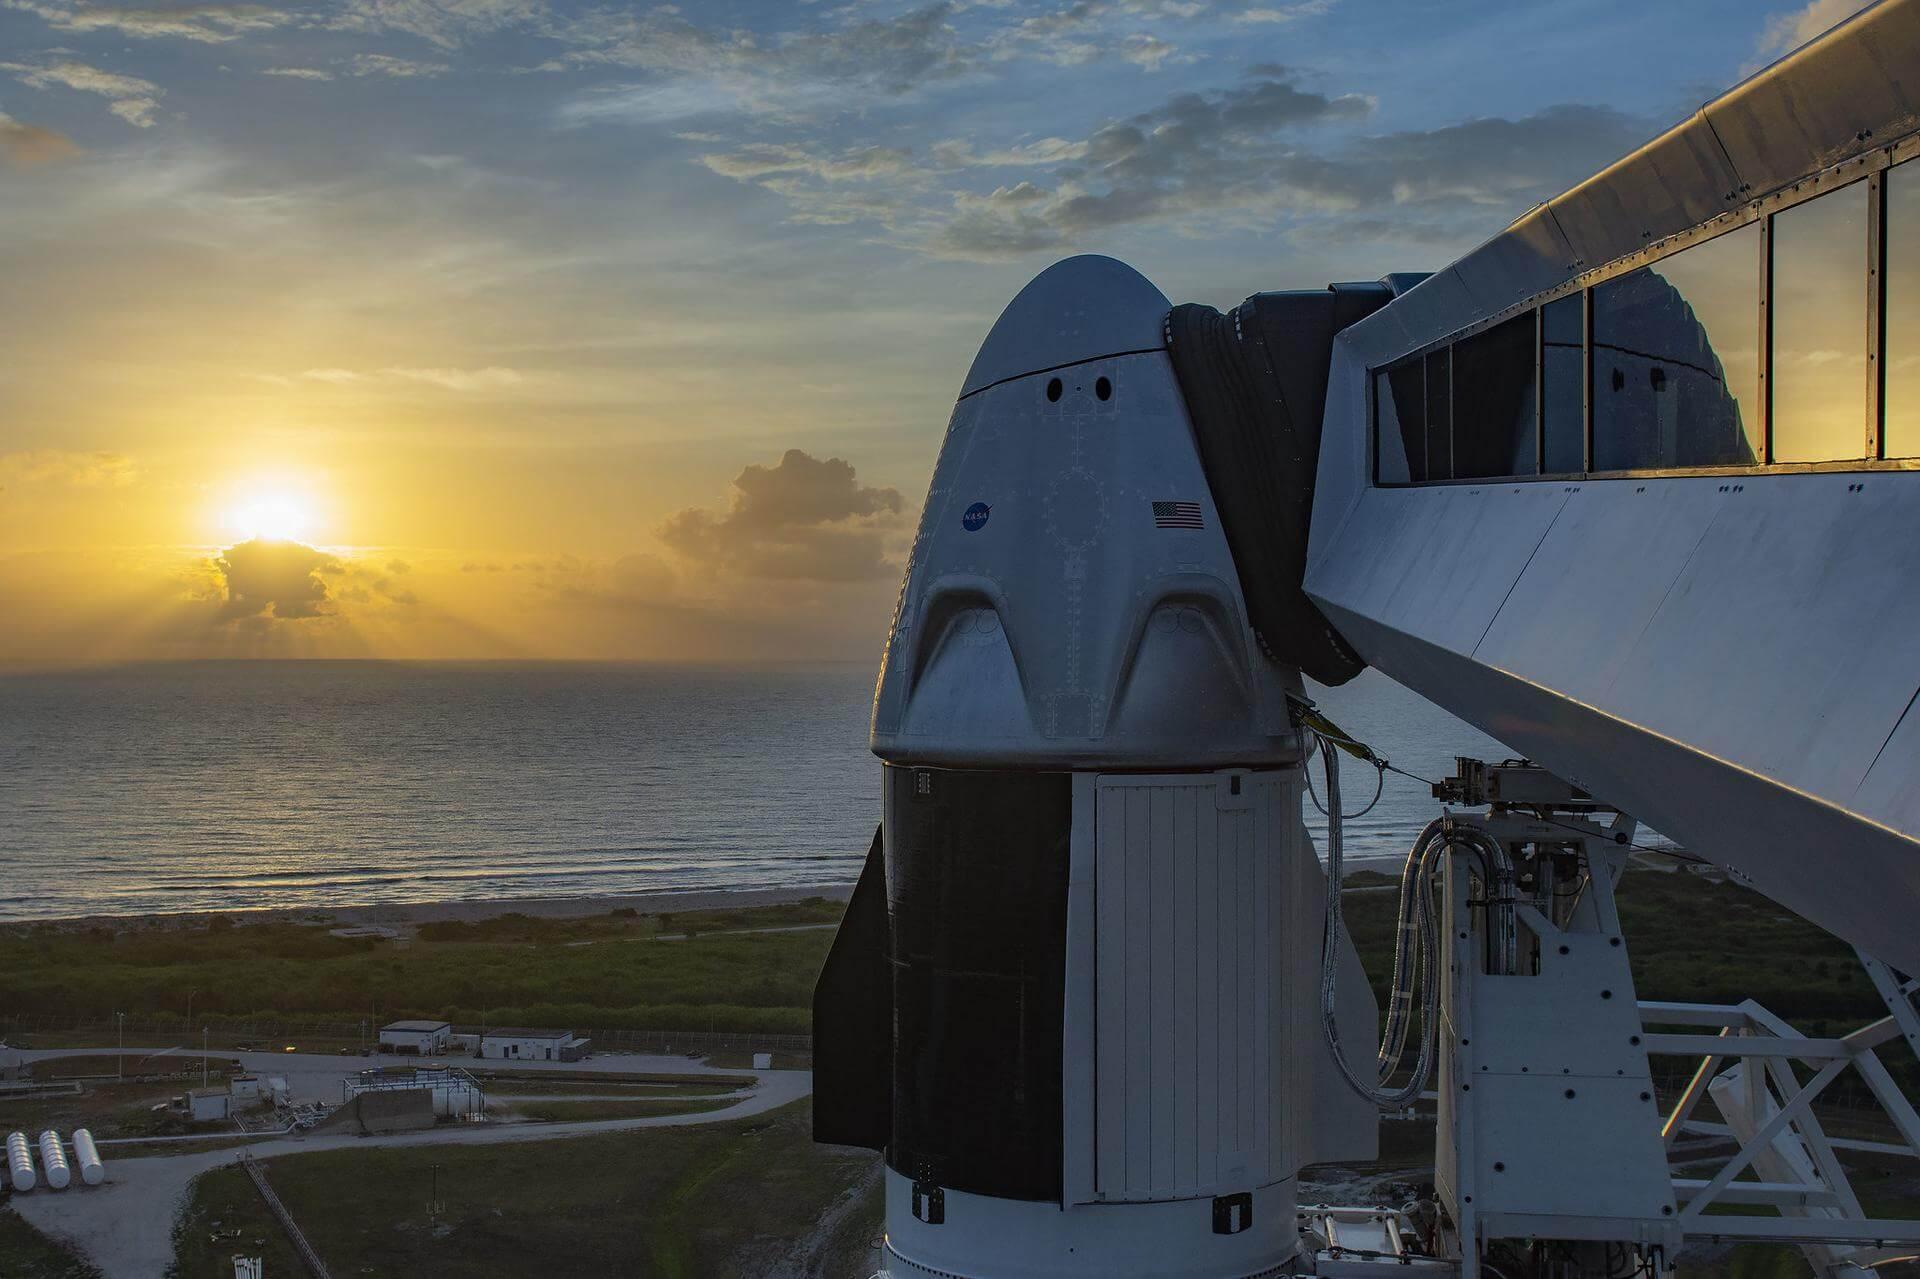 Upcoming rocket launch image